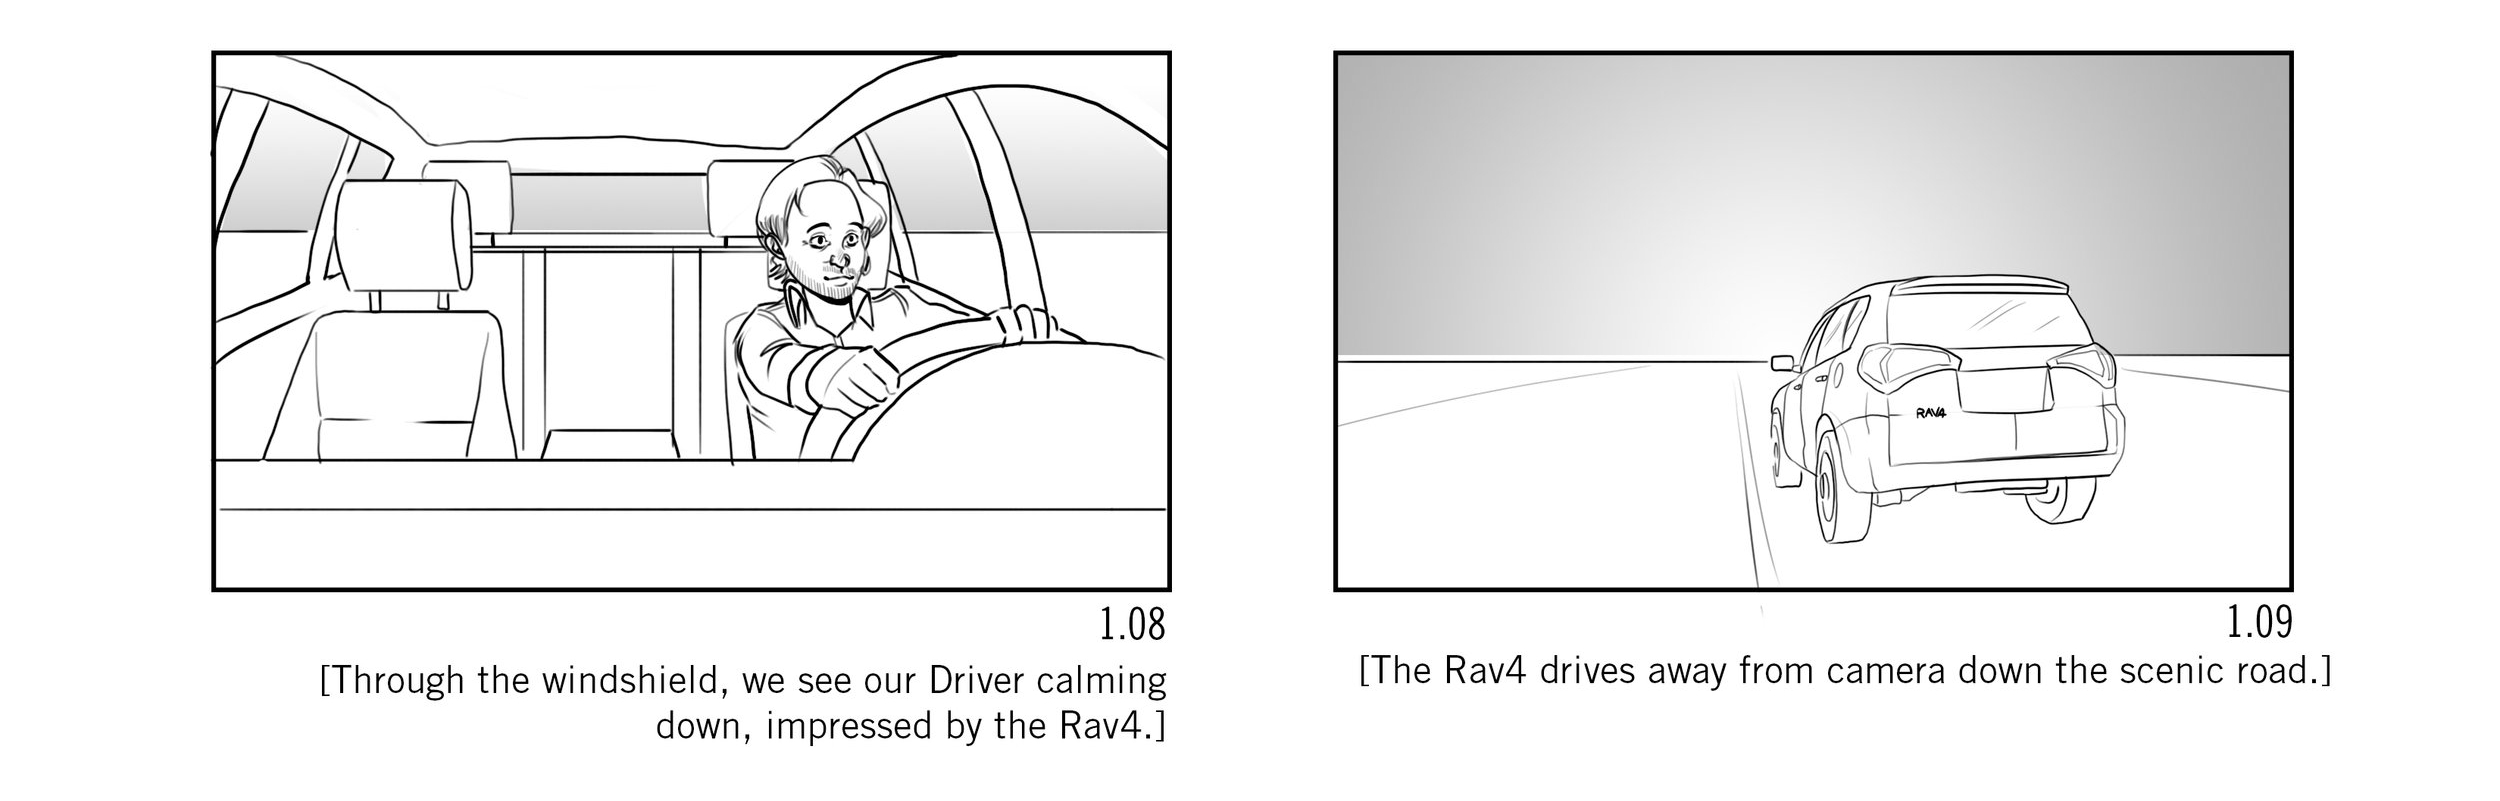 RAV4_007.jpg